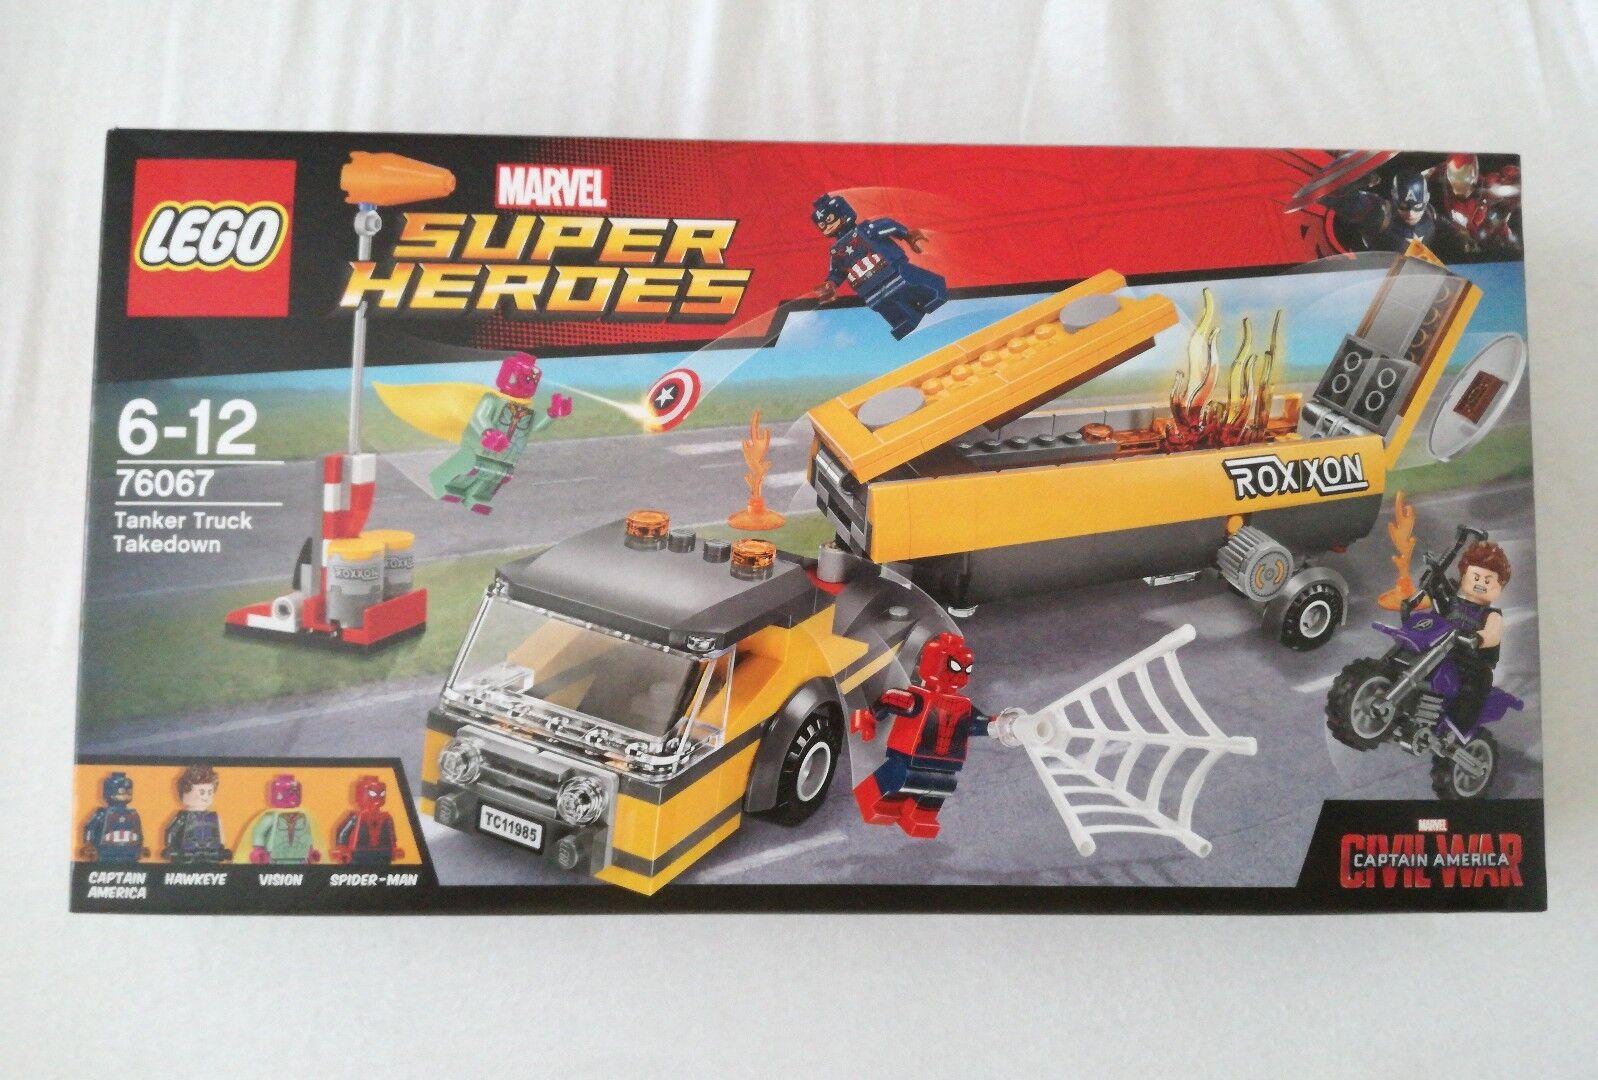 LEGO 76067 - Super Heroes Marvel -Spiderman - Tanker Truck Takedown - neu & ovp